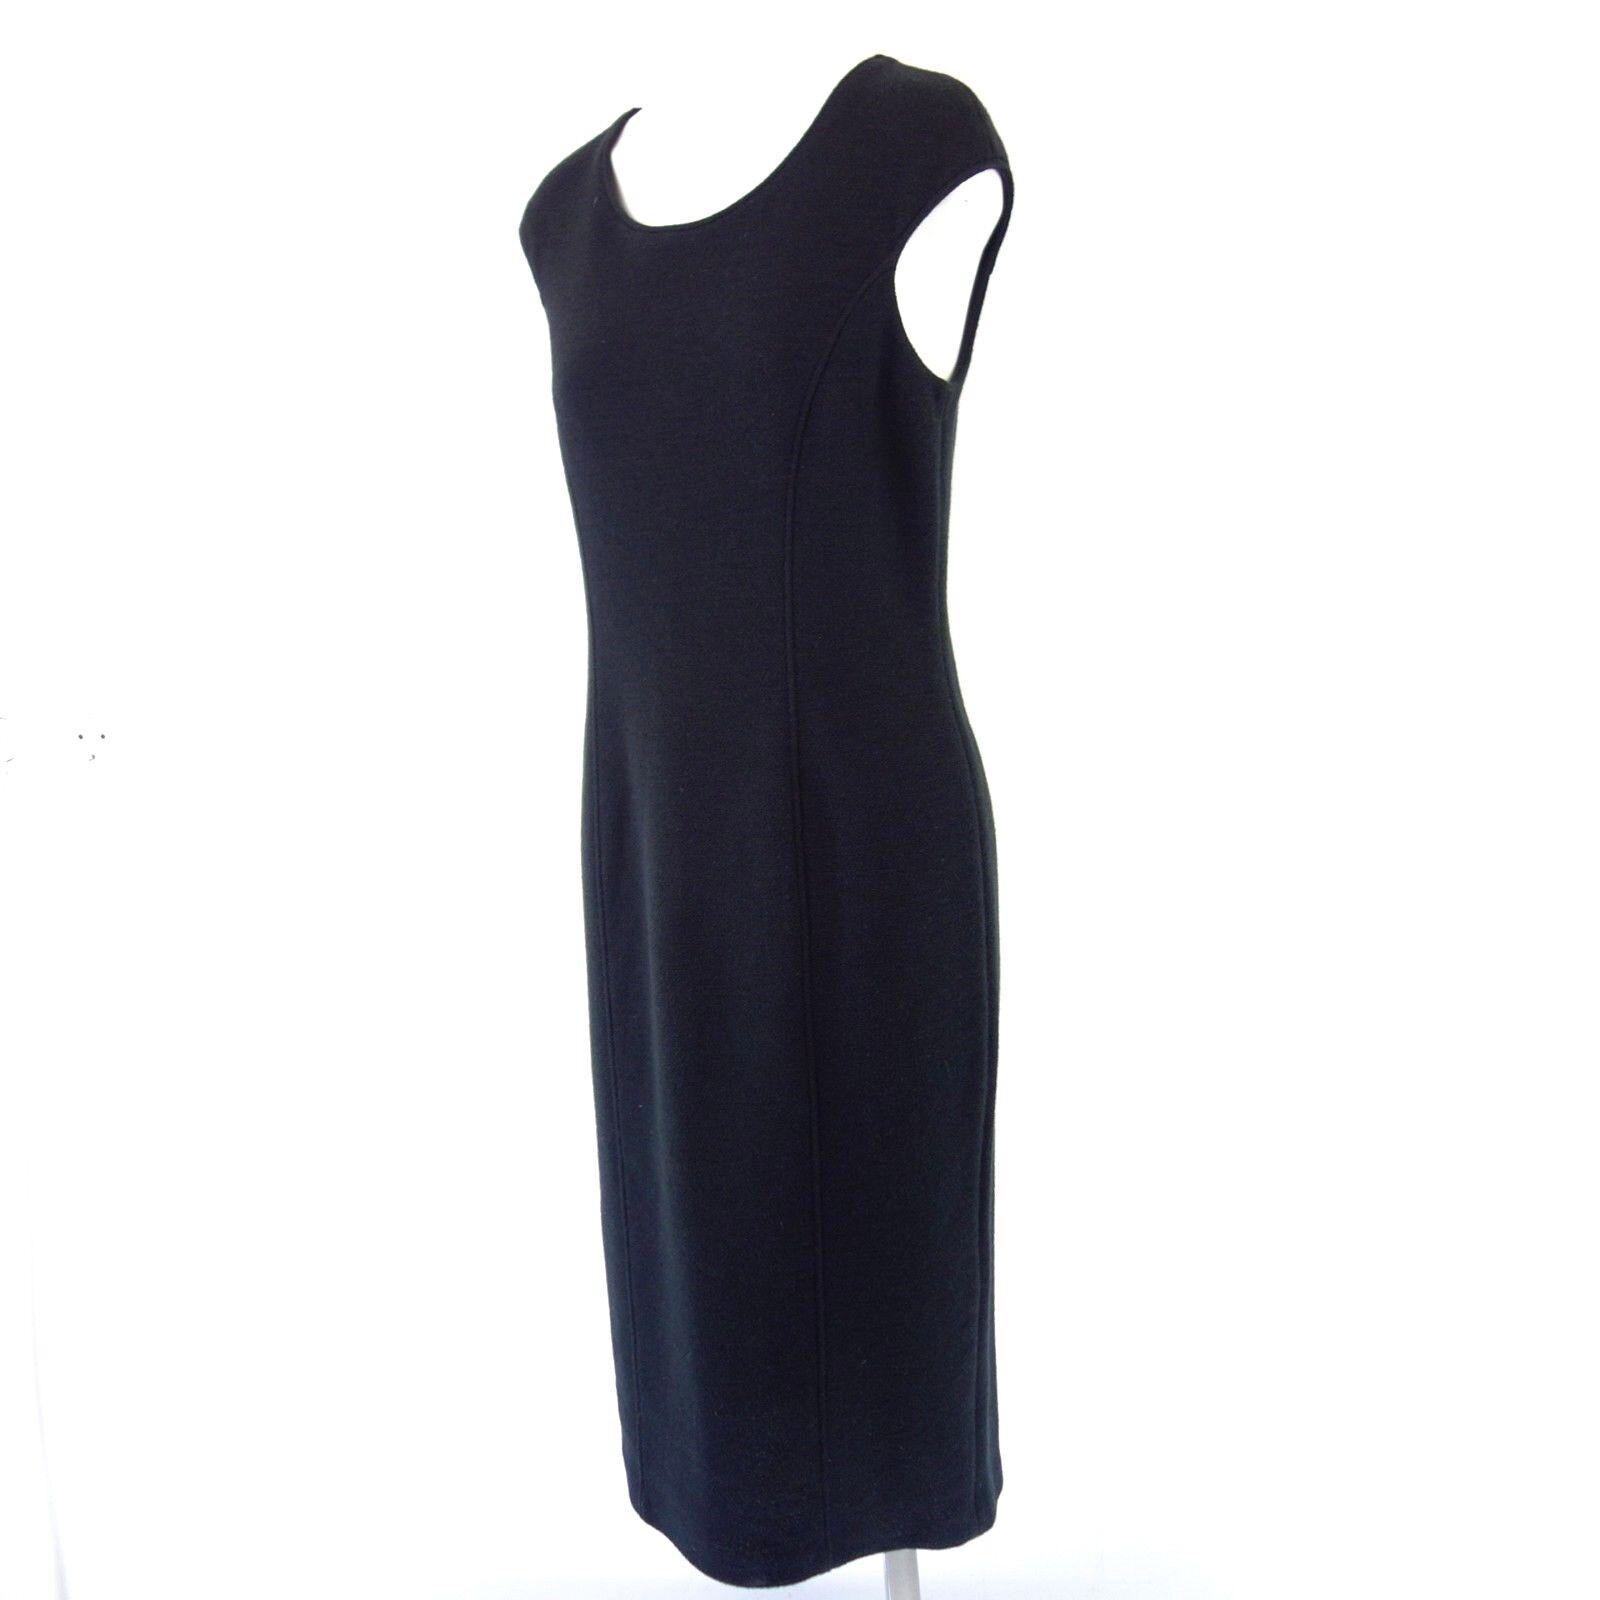 ARMANI COLLEZIONI Damen Kleid IT 44 DE 38 Schwarz Etuikleid mit Wolle NP 599 NEU